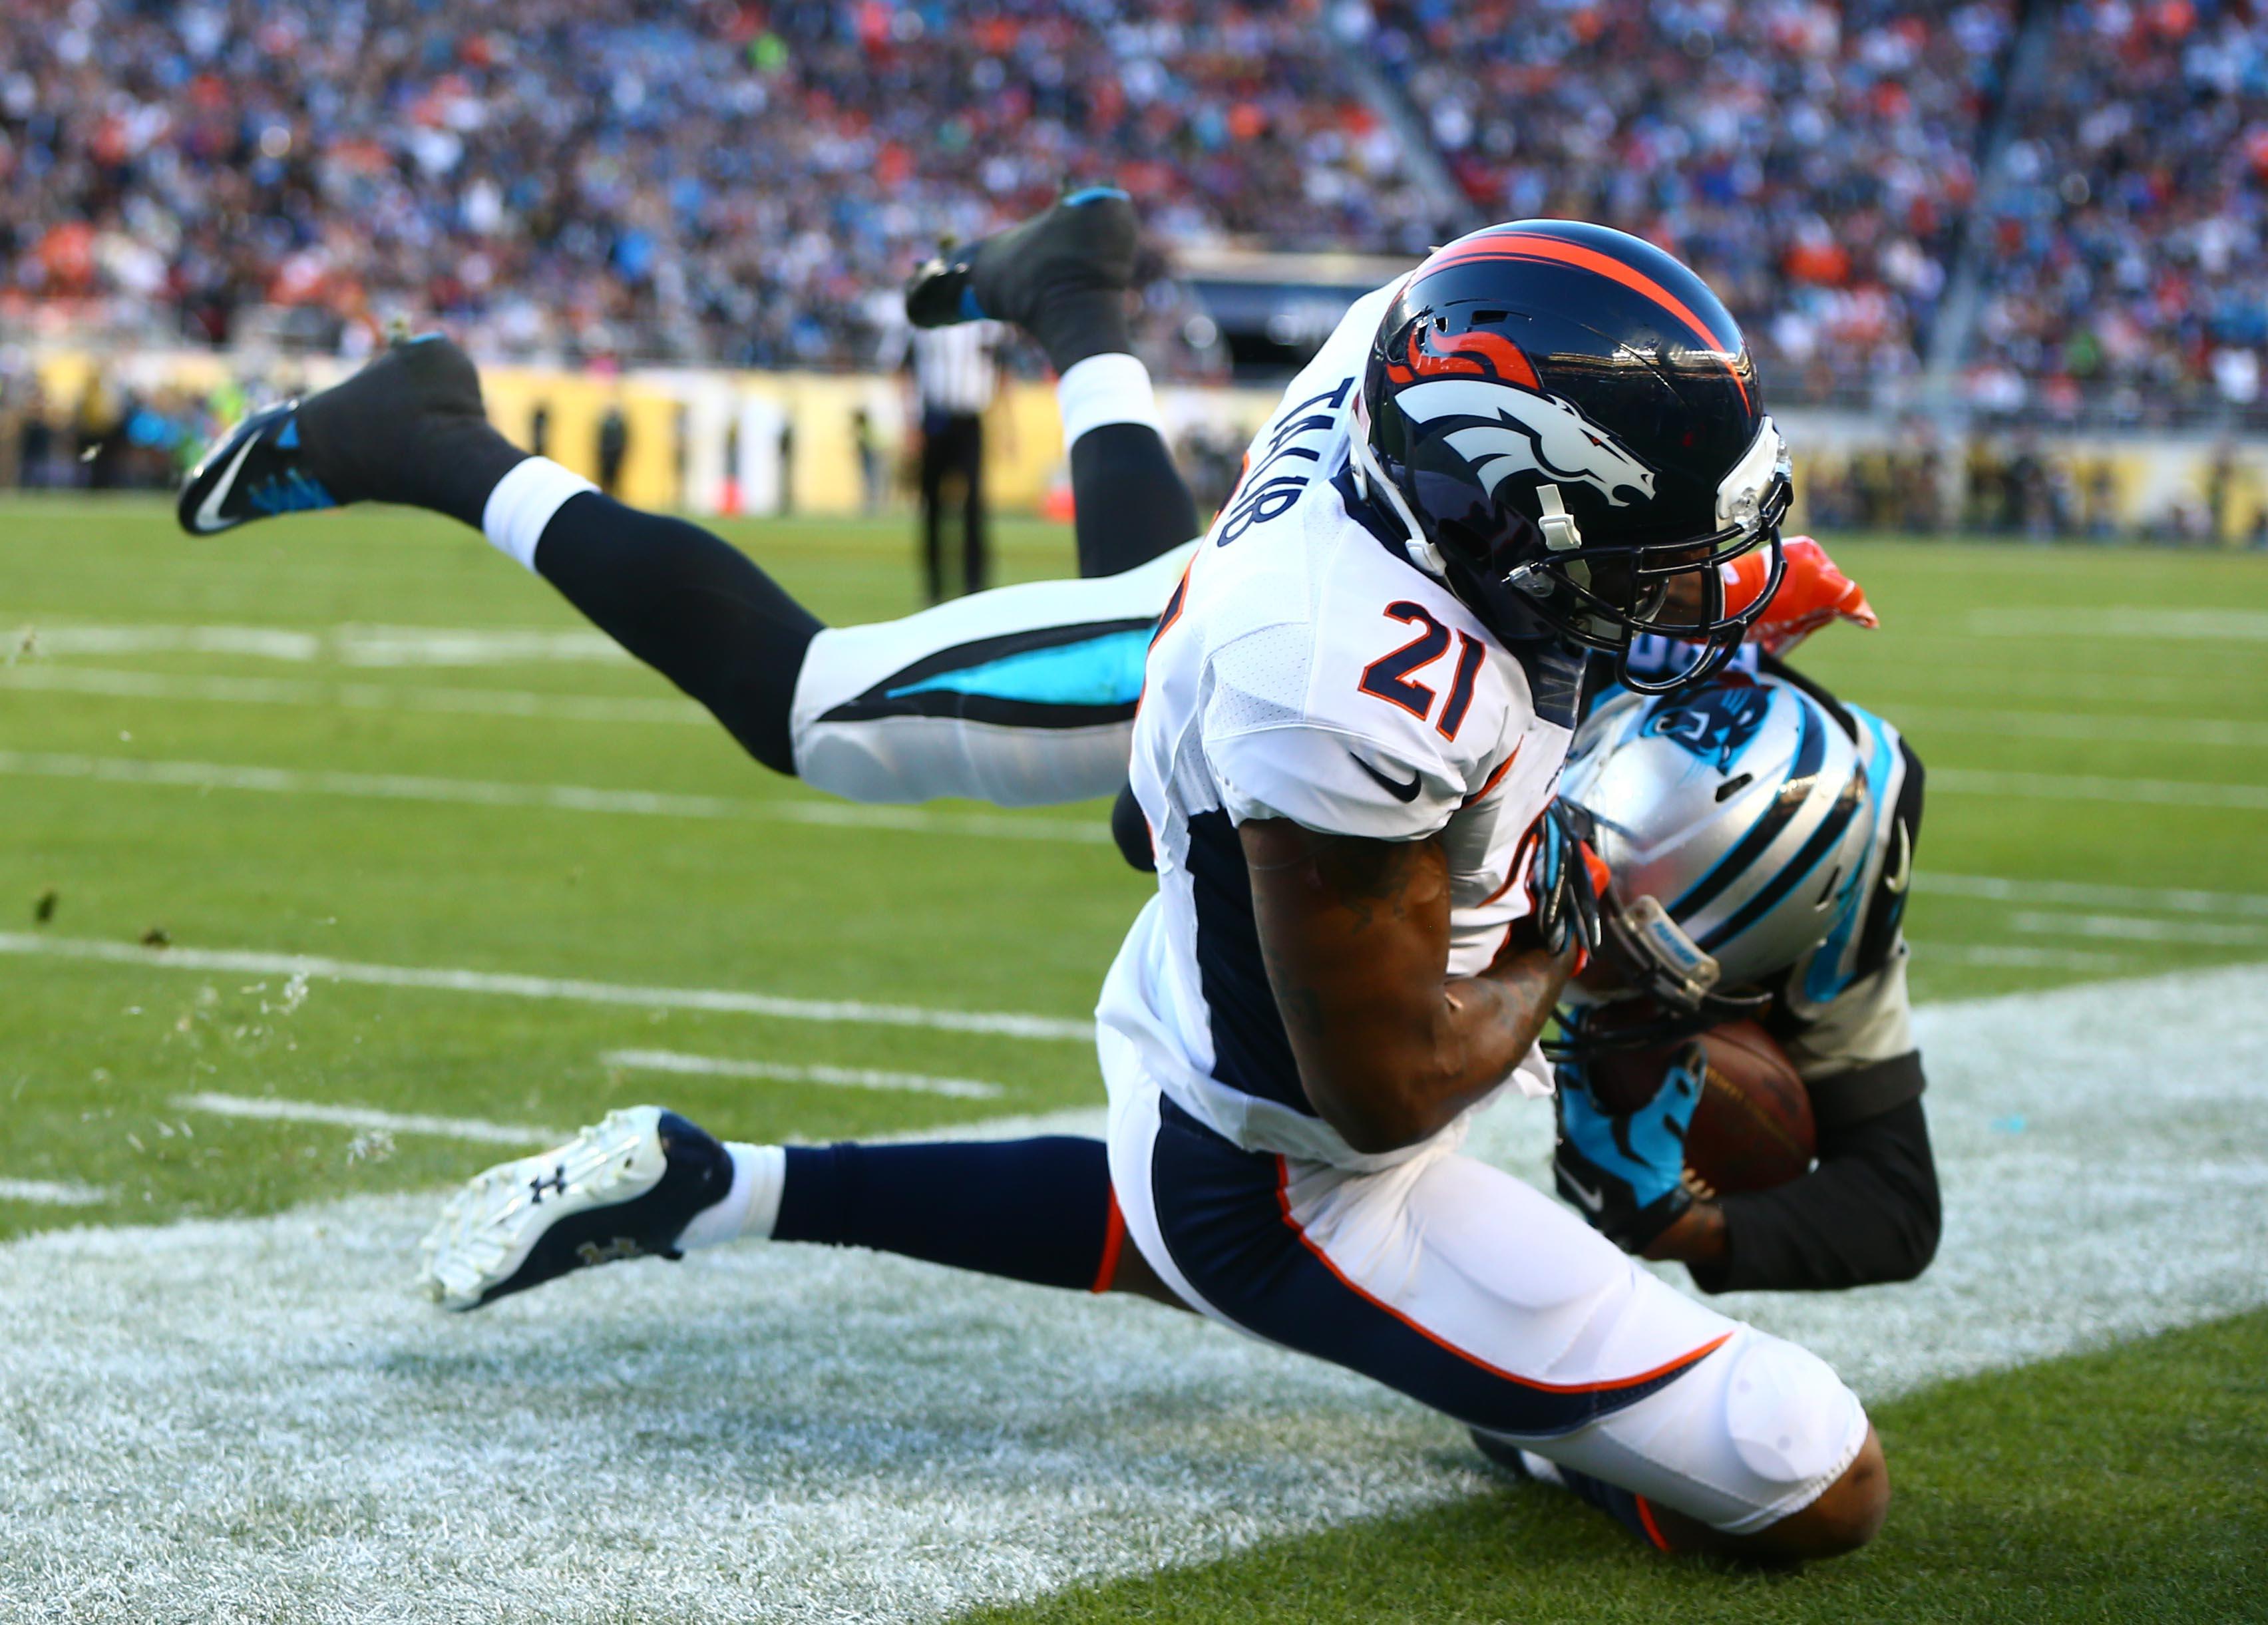 NFL fines Broncos CB Aqib Talib for personal fouls in Super Bowl